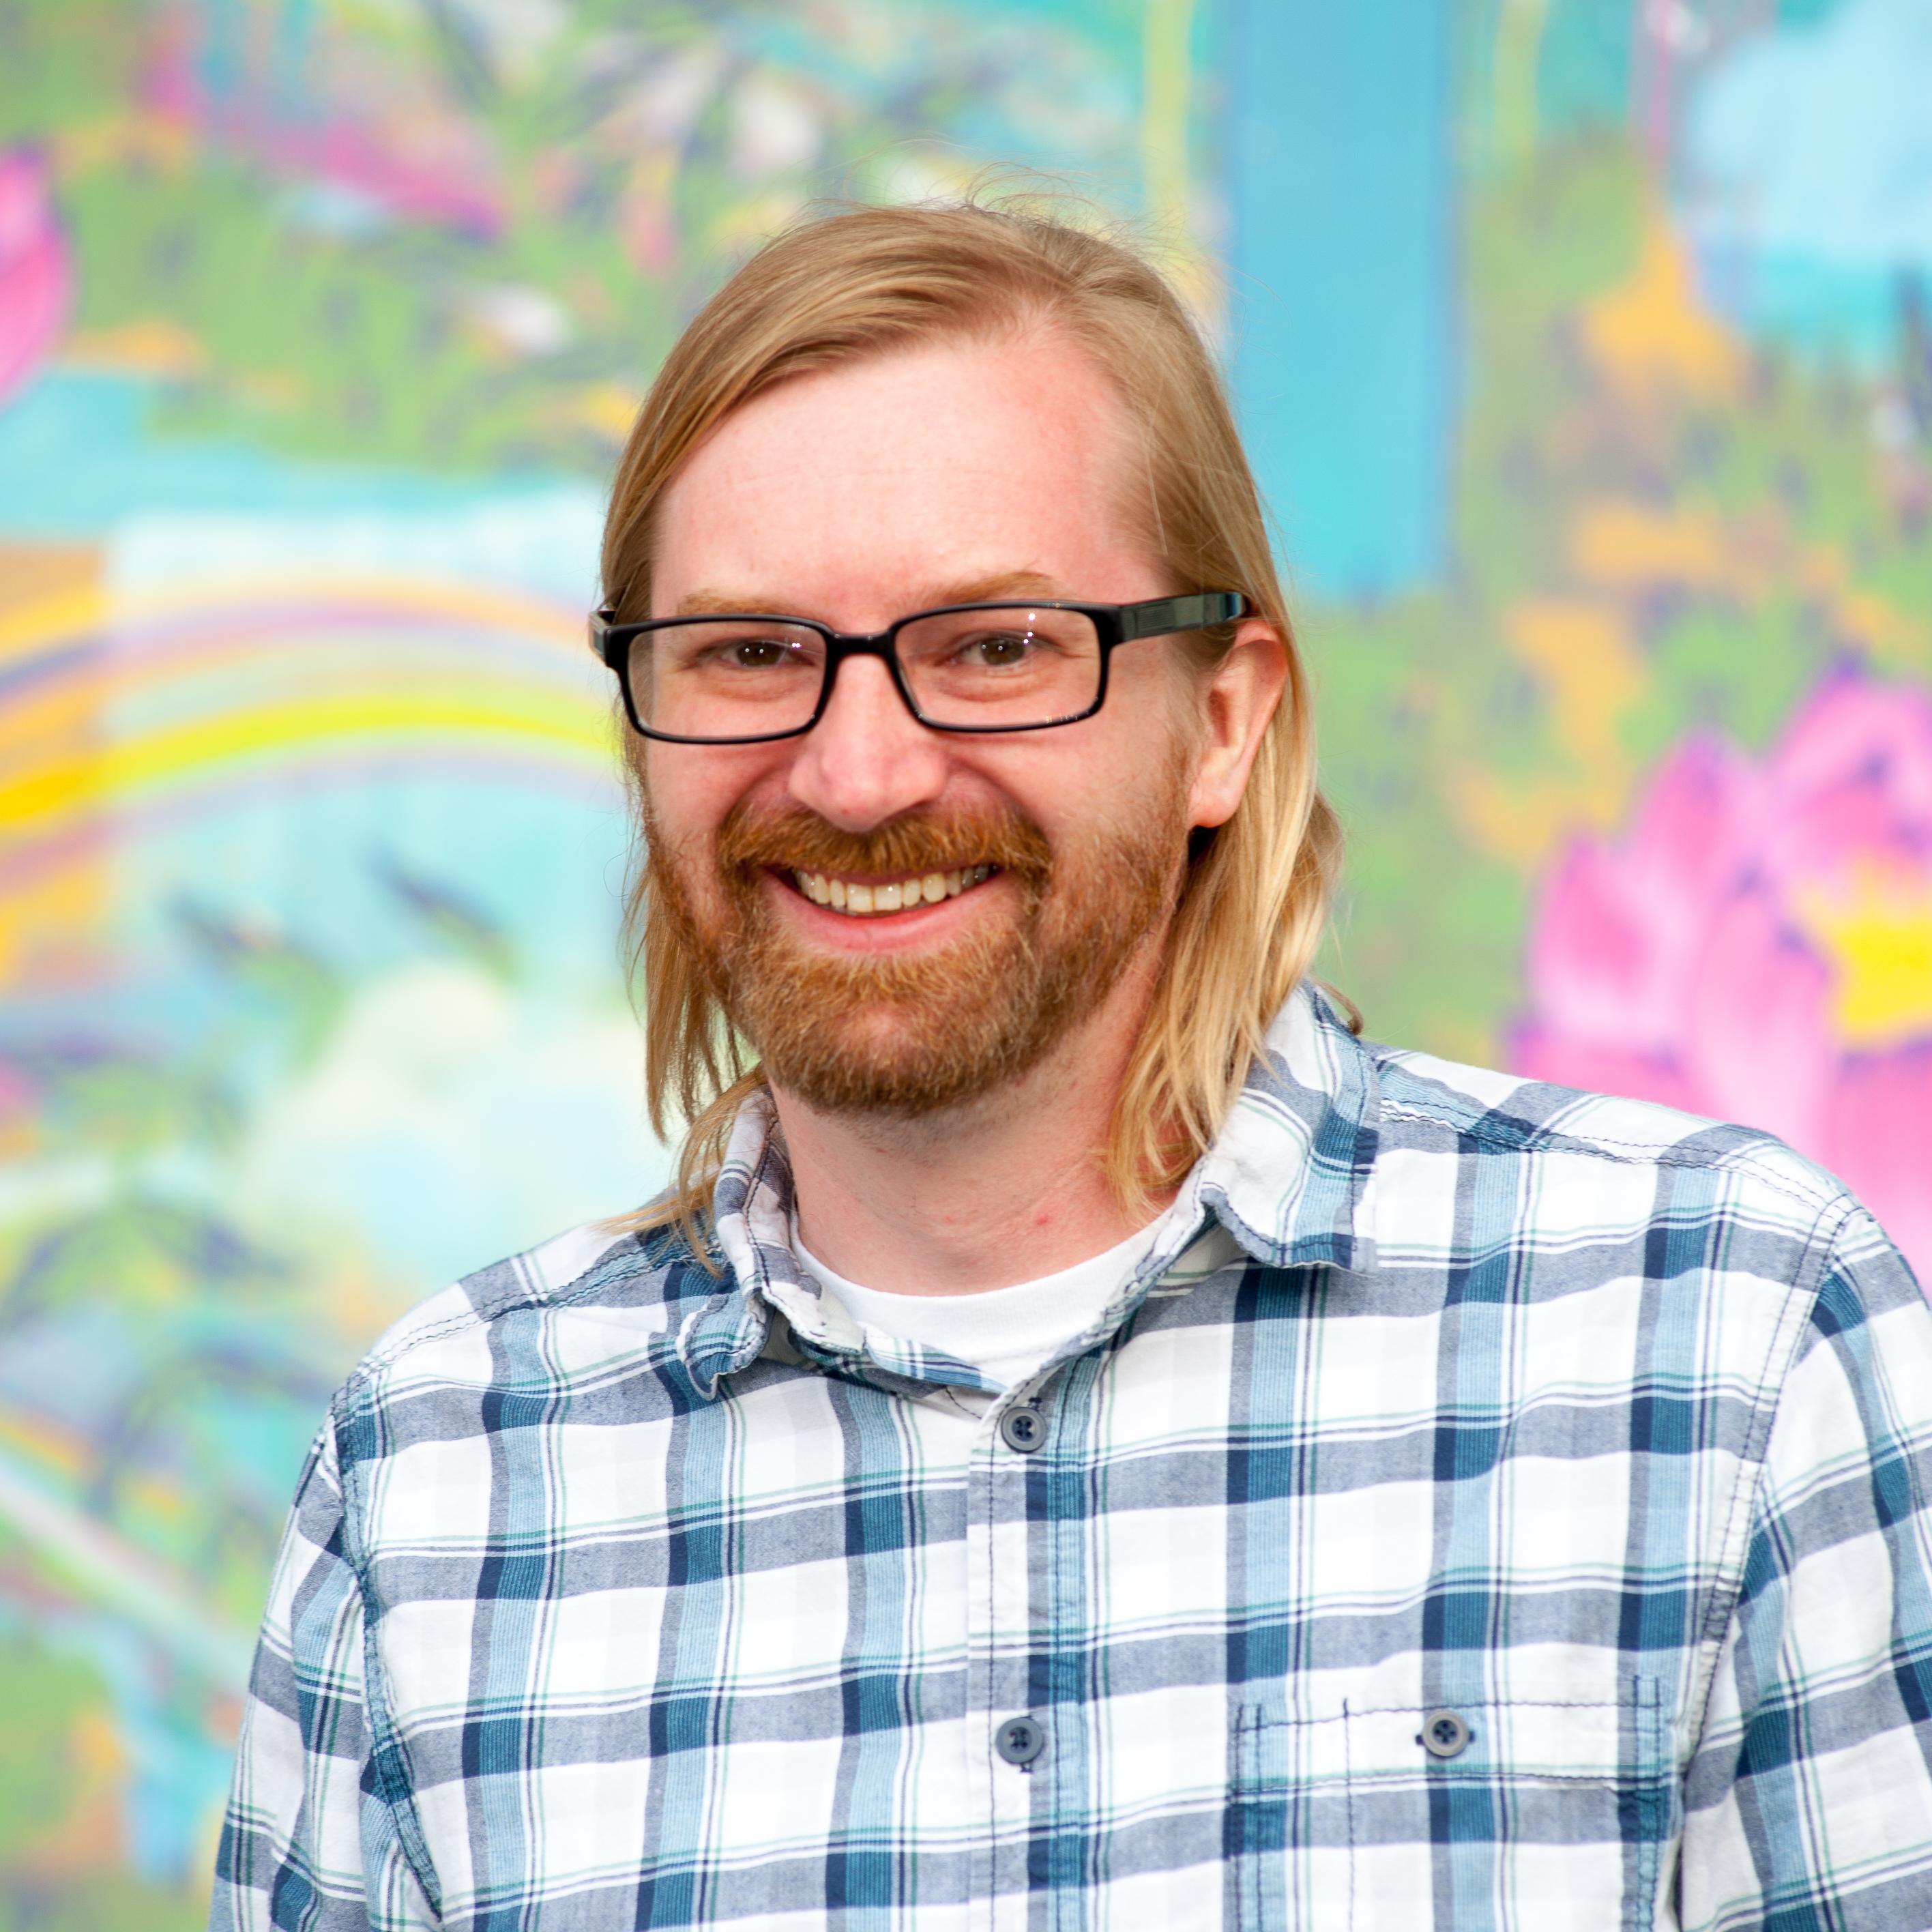 Head shot of Tim Renner